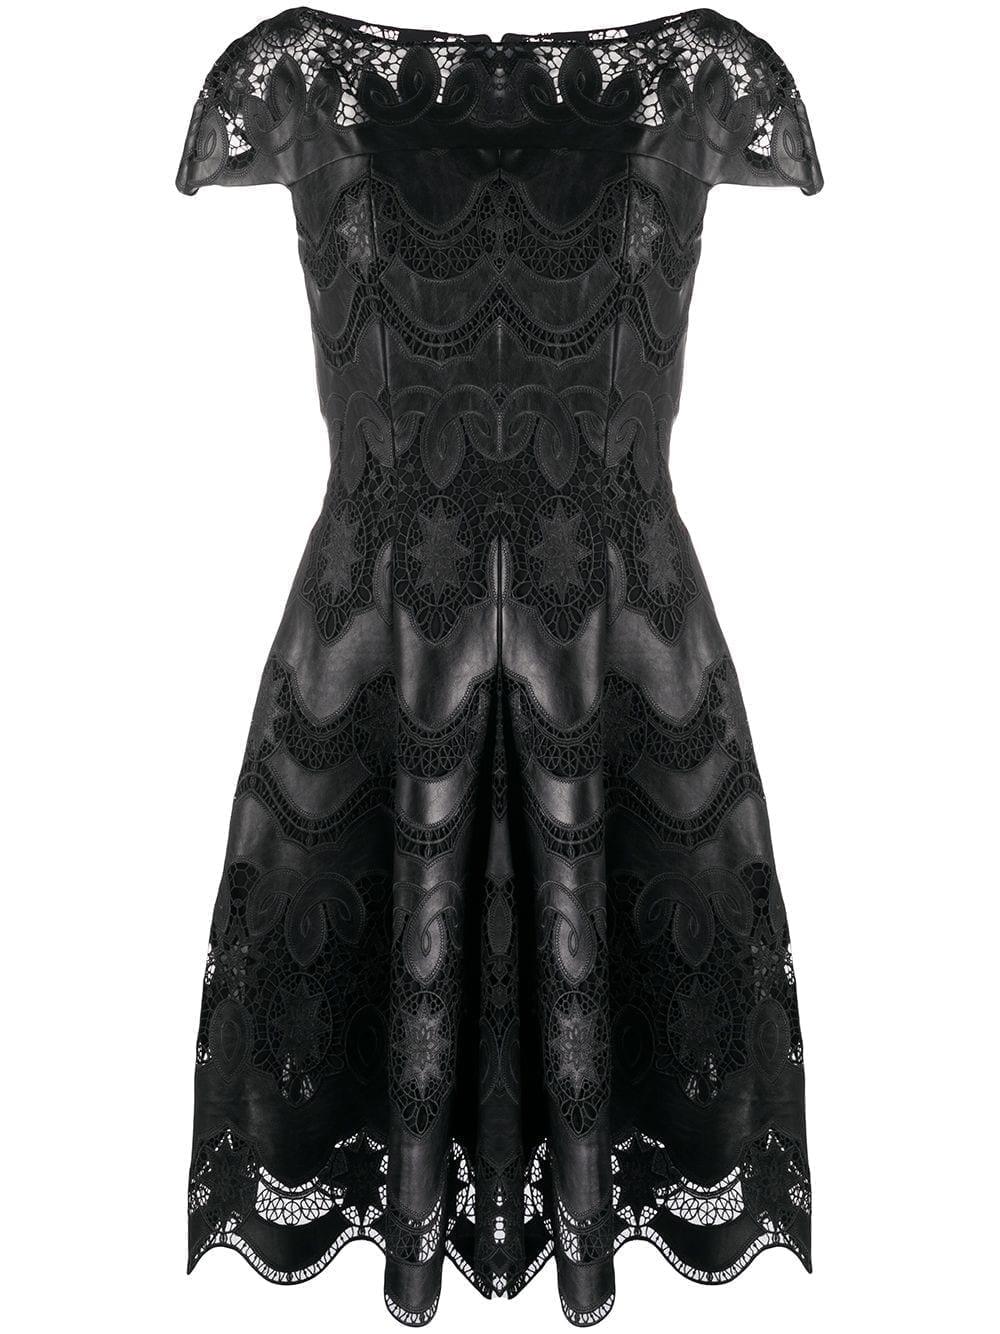 TALBOT RUNHOF Faux Leather Laser-cut Dress